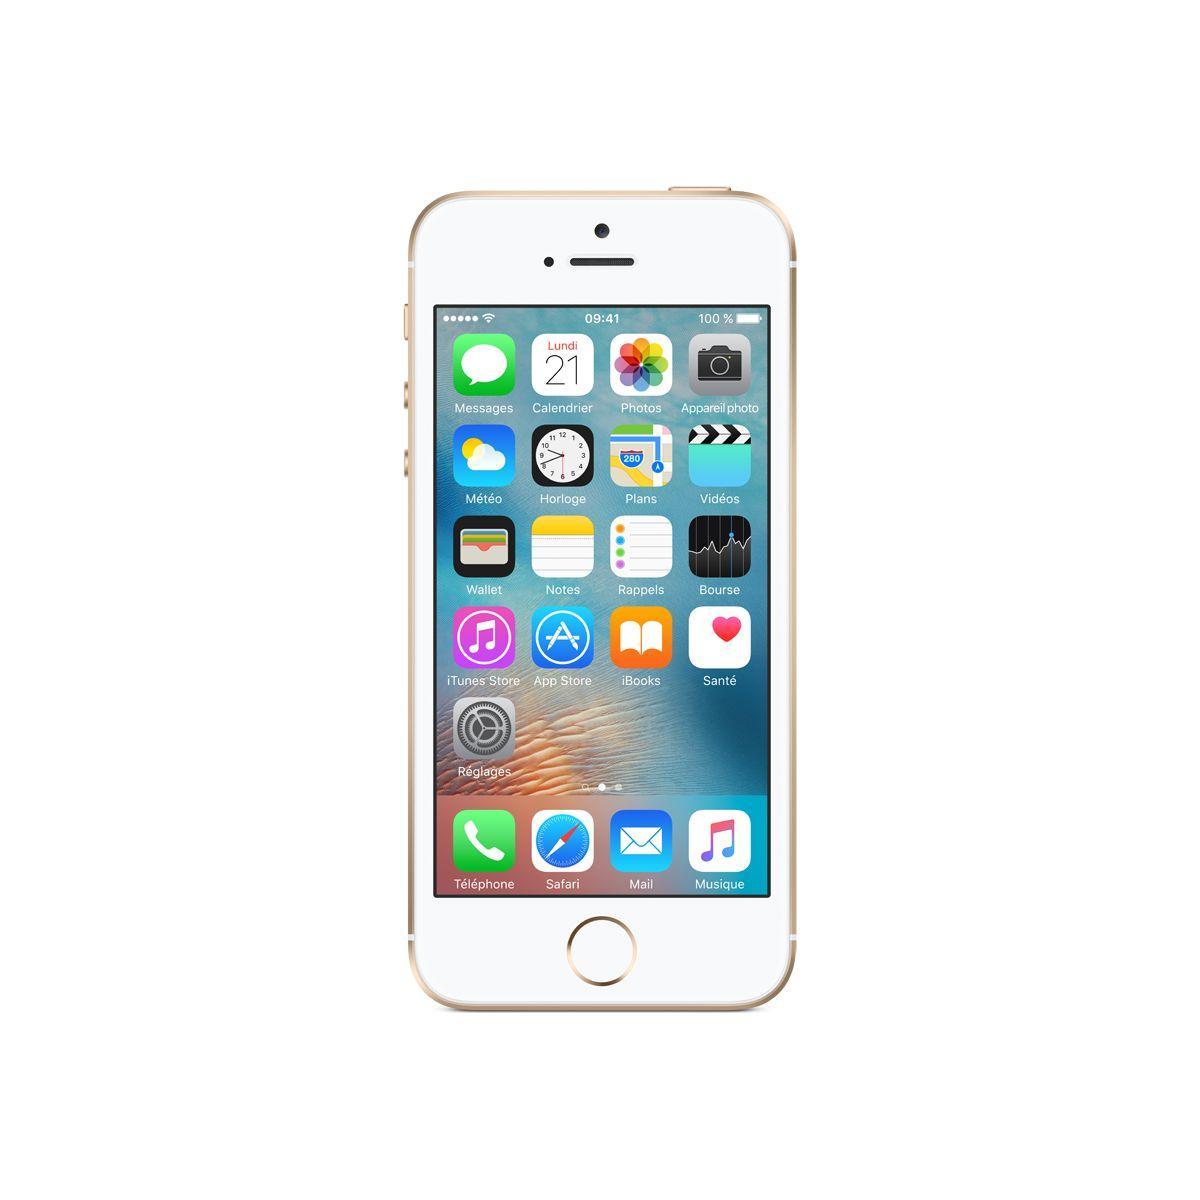 Smartphone apple iphone se 128go gold - livraison offerte : code livrelais